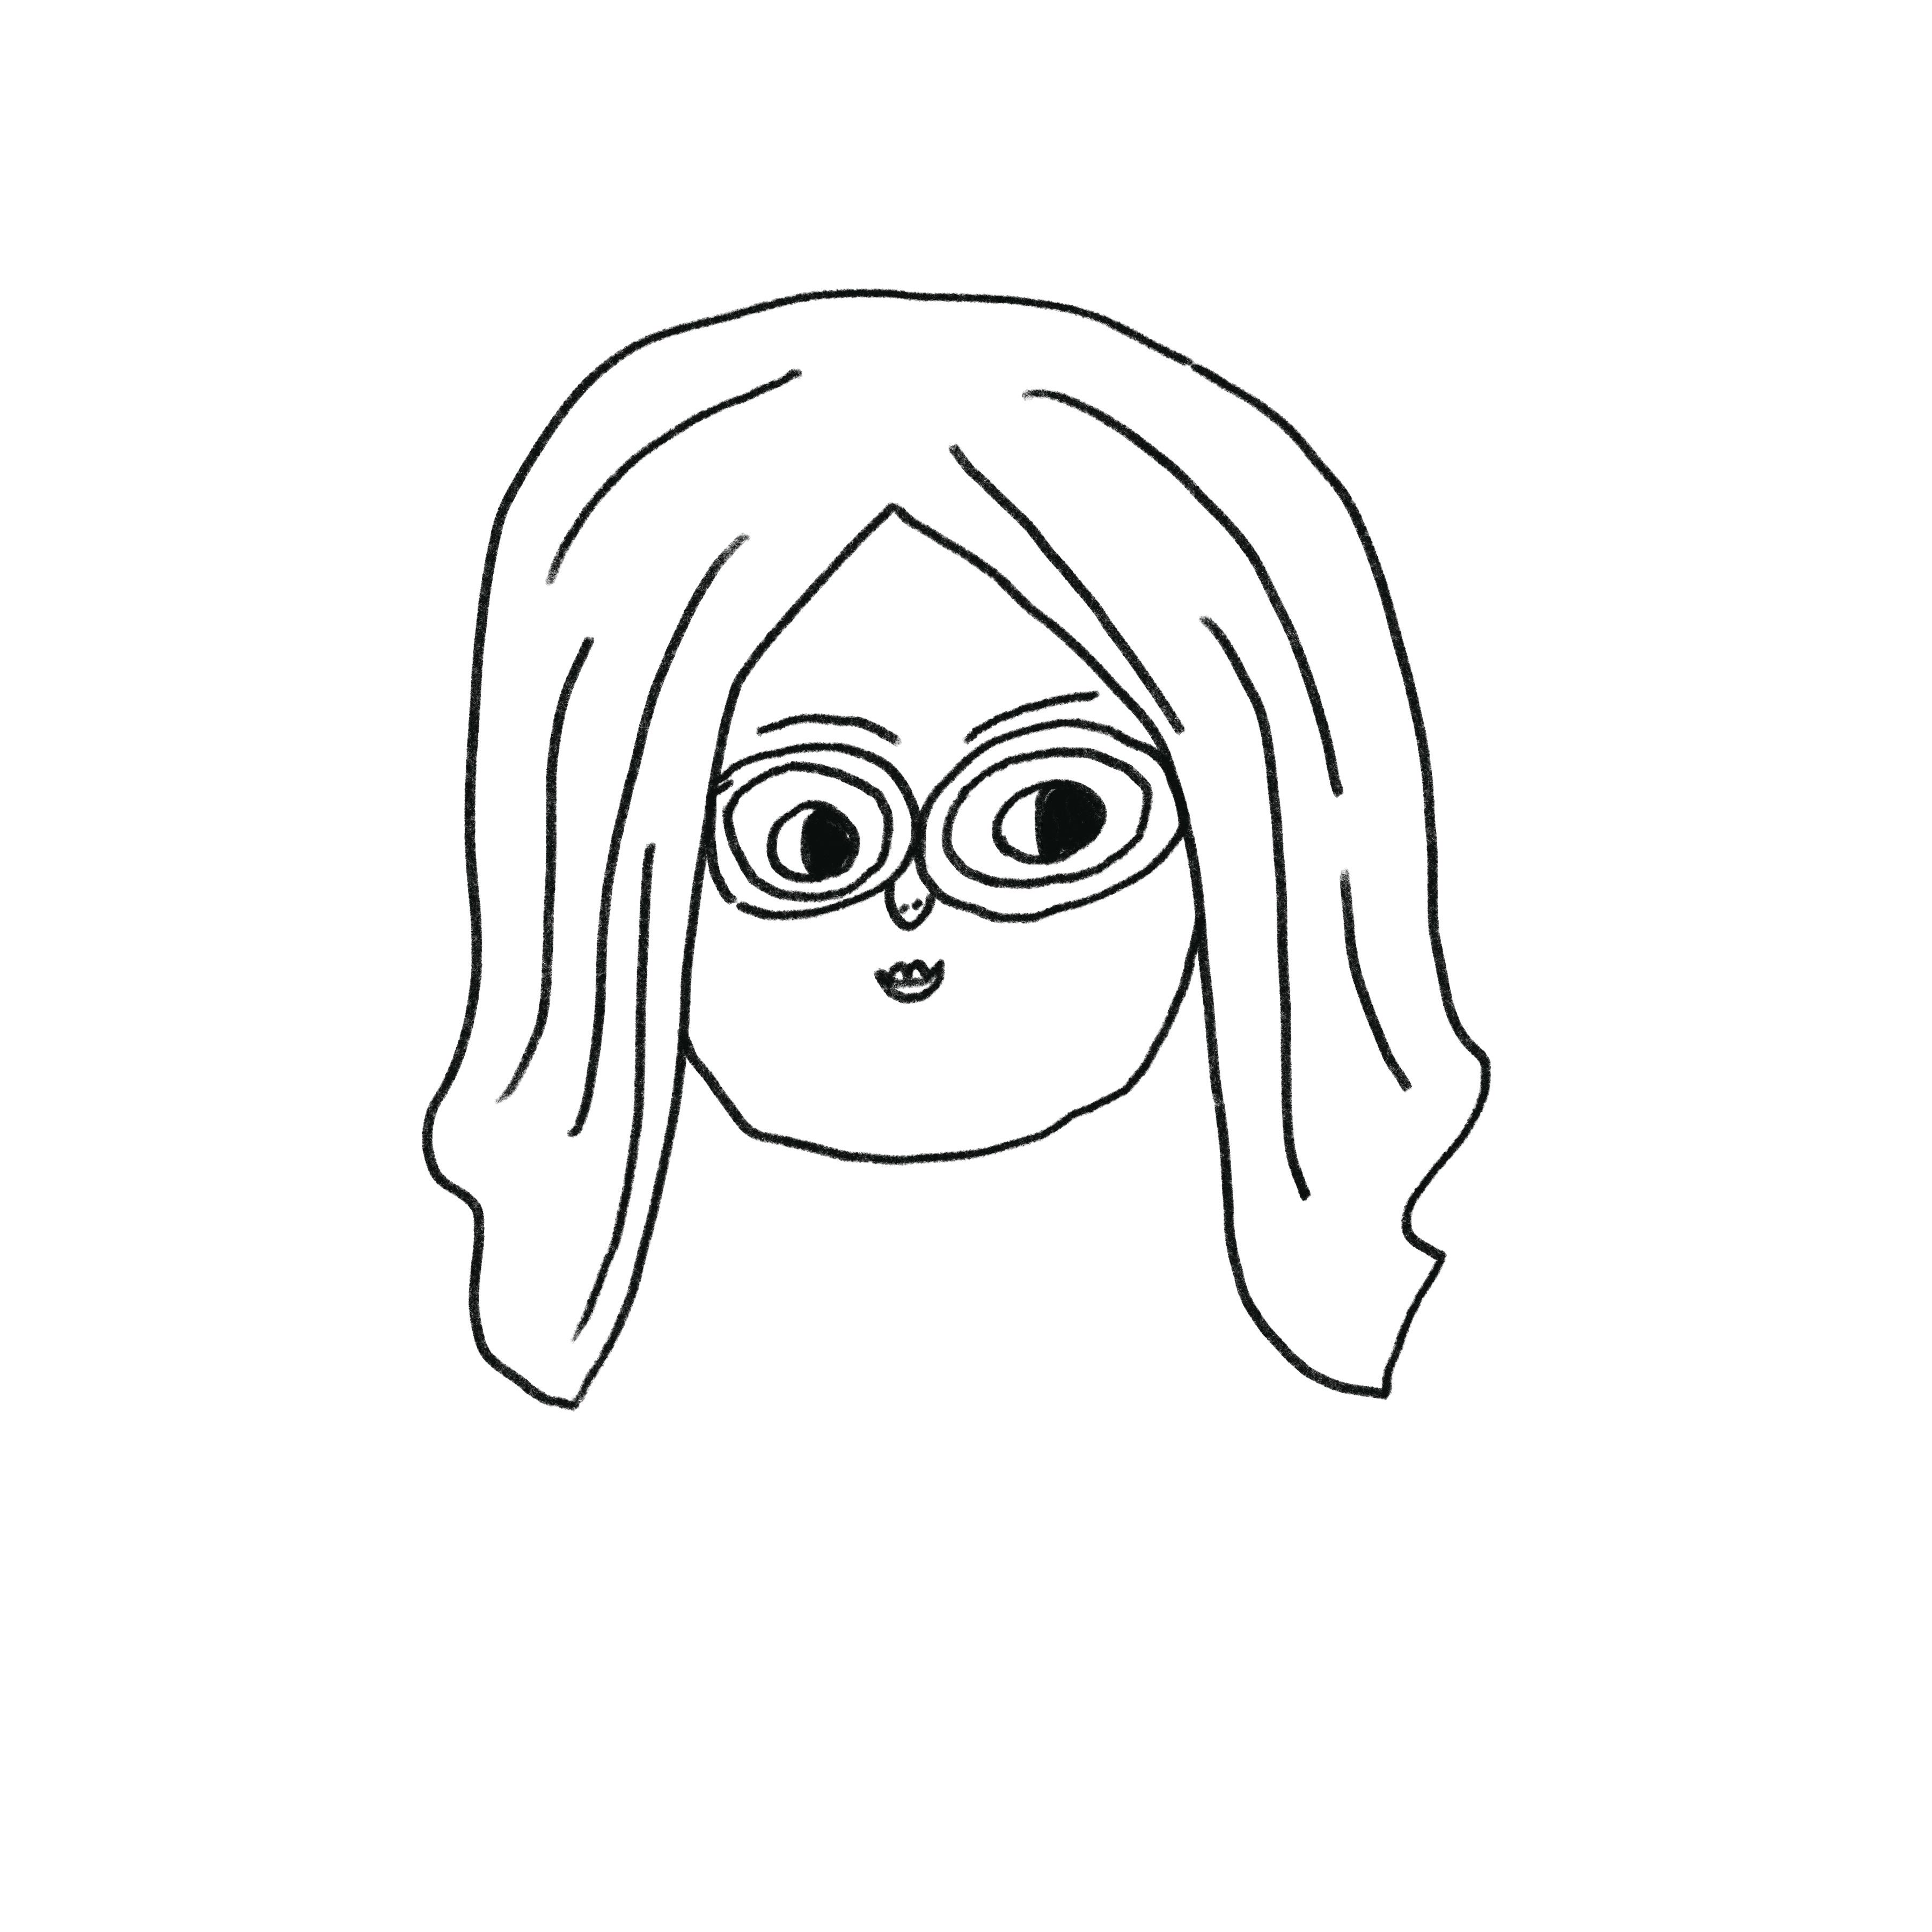 2019, self portrait Monika Forsberg.